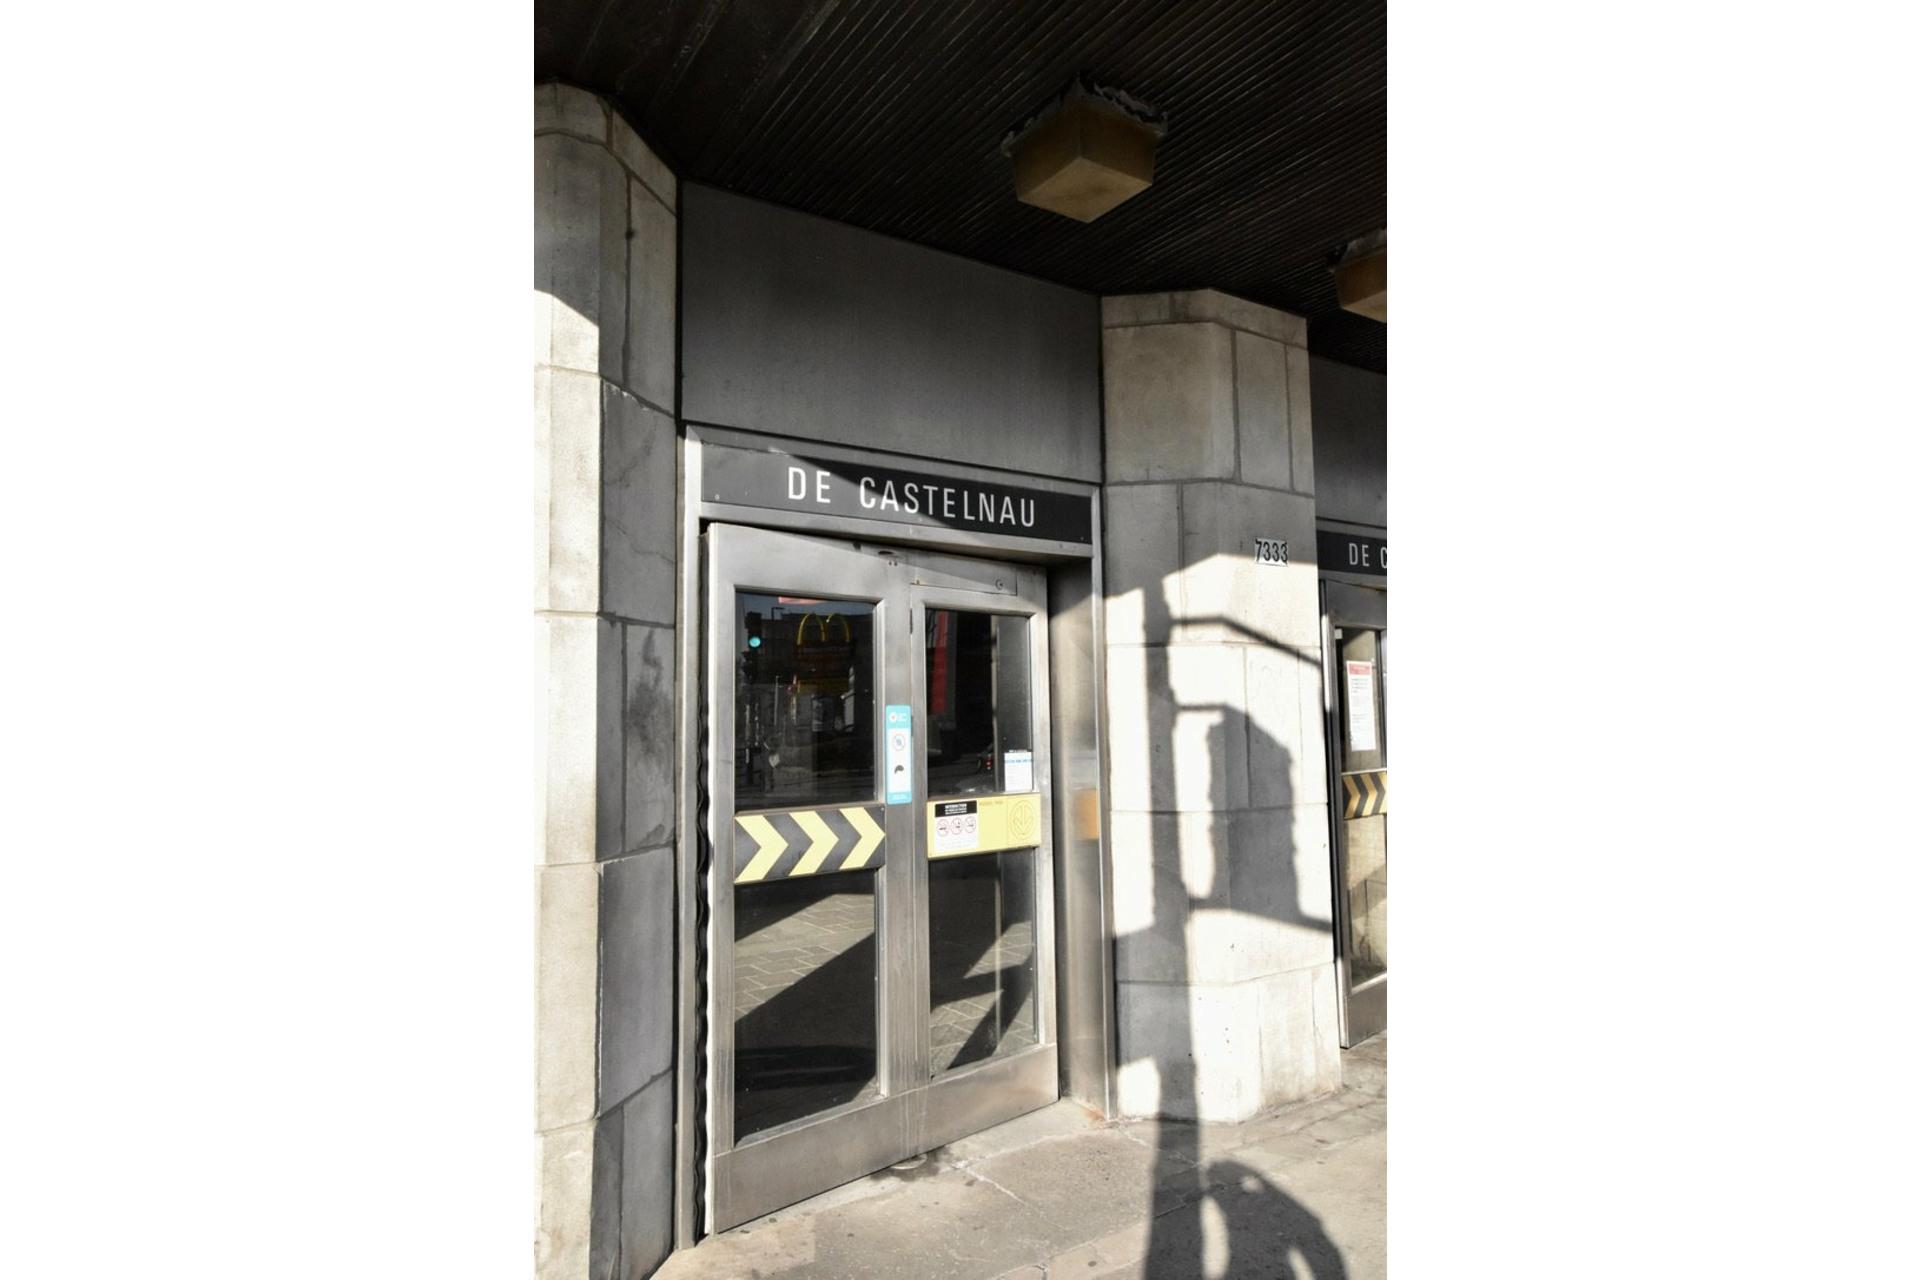 image 2 - Departamento Para alquiler Villeray/Saint-Michel/Parc-Extension Montréal  - 3 habitaciones